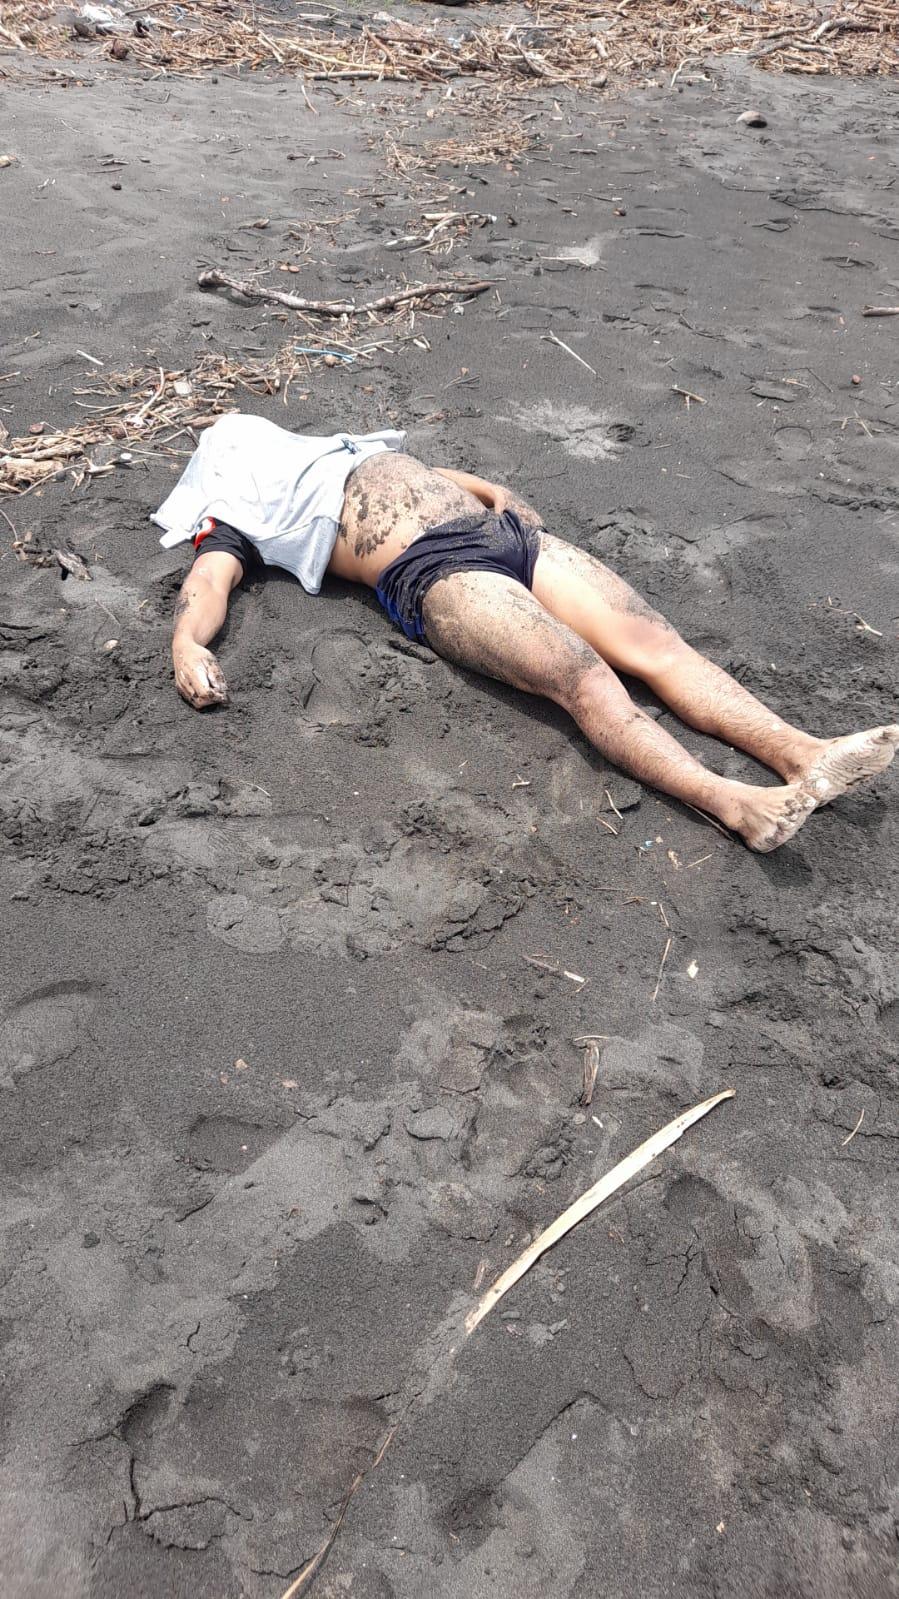 Hallan cadáver en playa San Blas